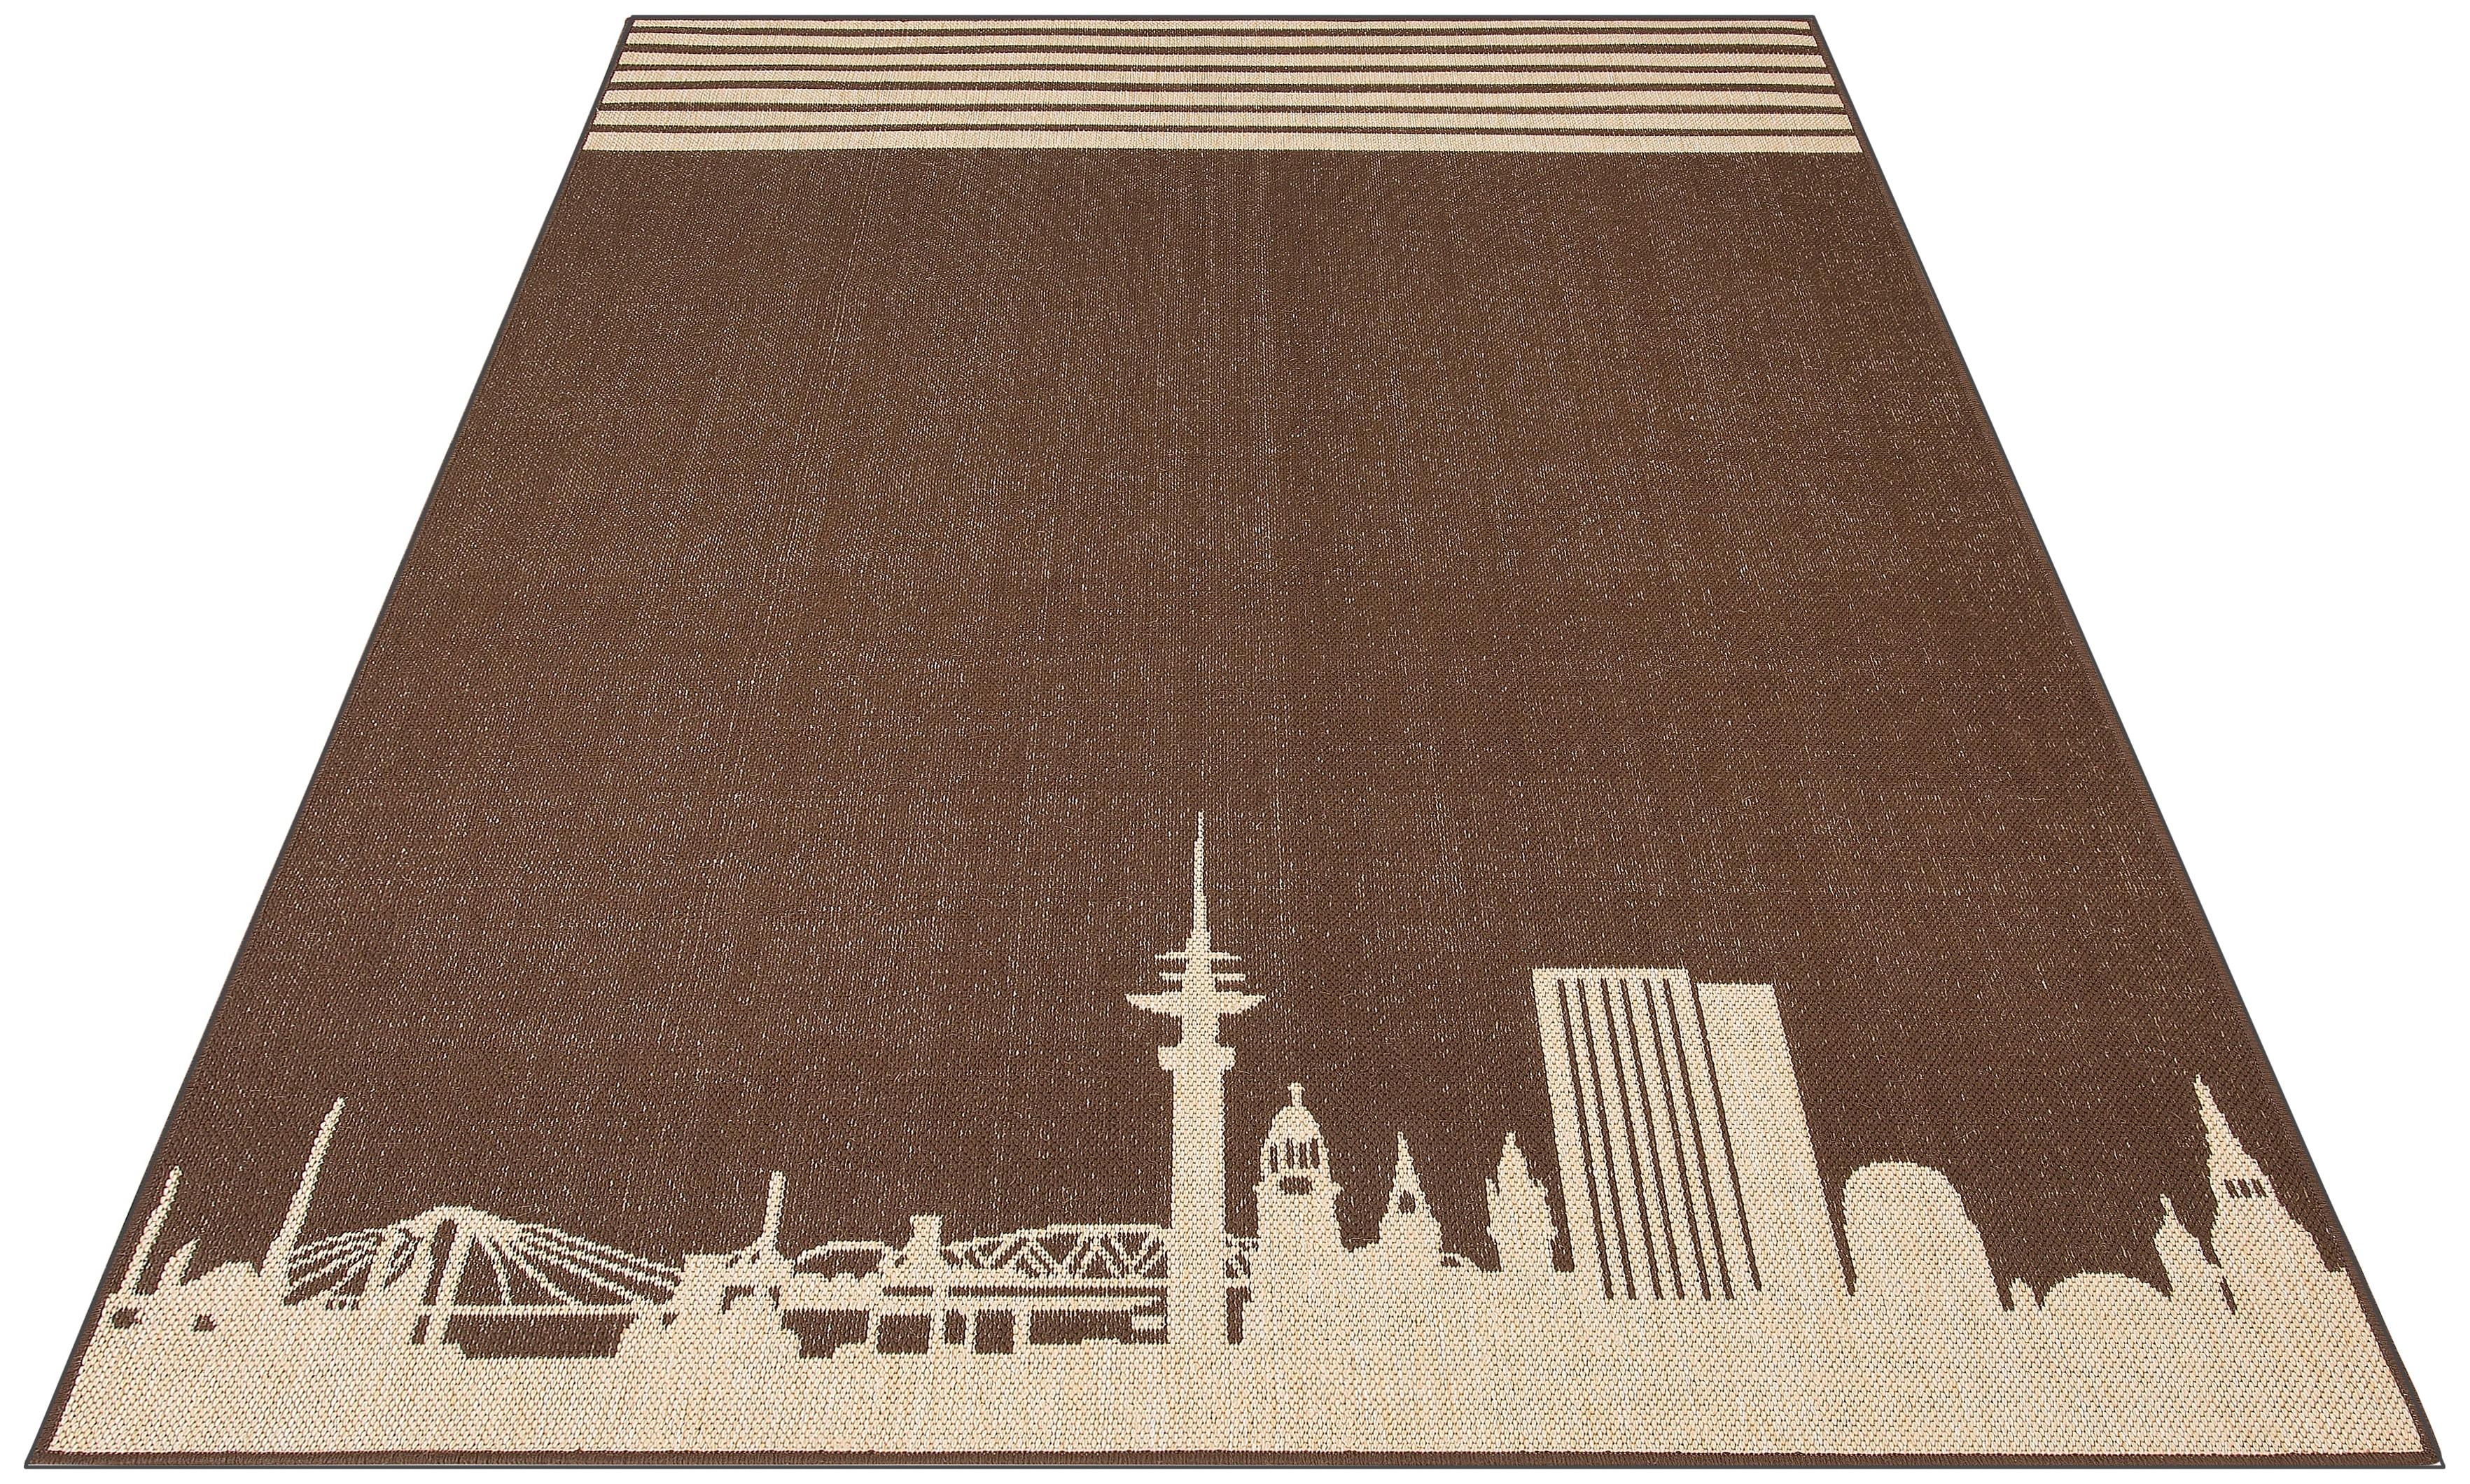 Teppich Hamburg my home rechteckig Höhe 2 mm maschinell gewebt